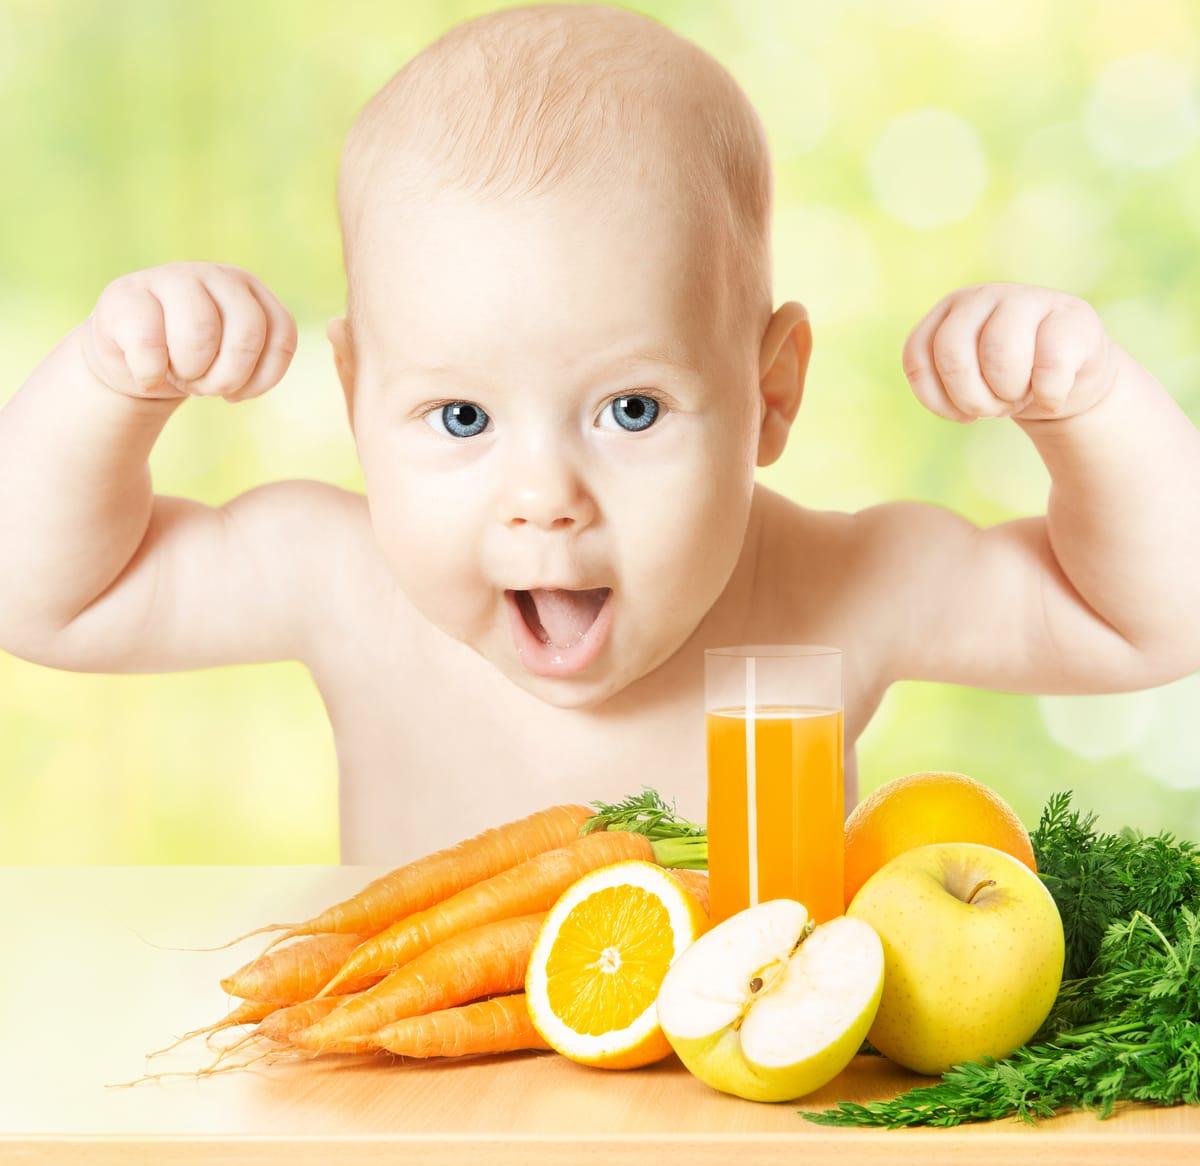 Is juicing safe for kids?